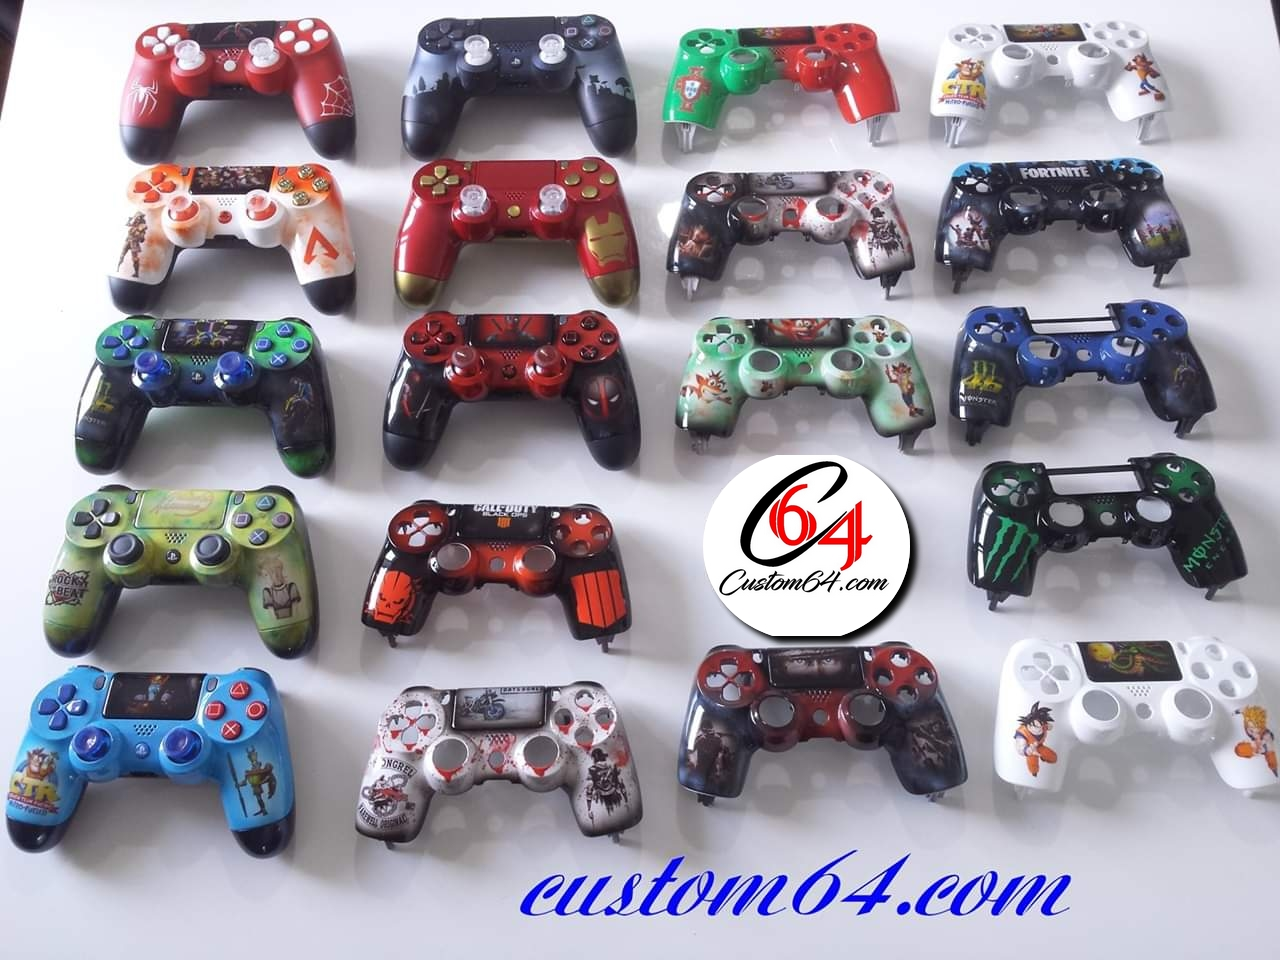 custom64